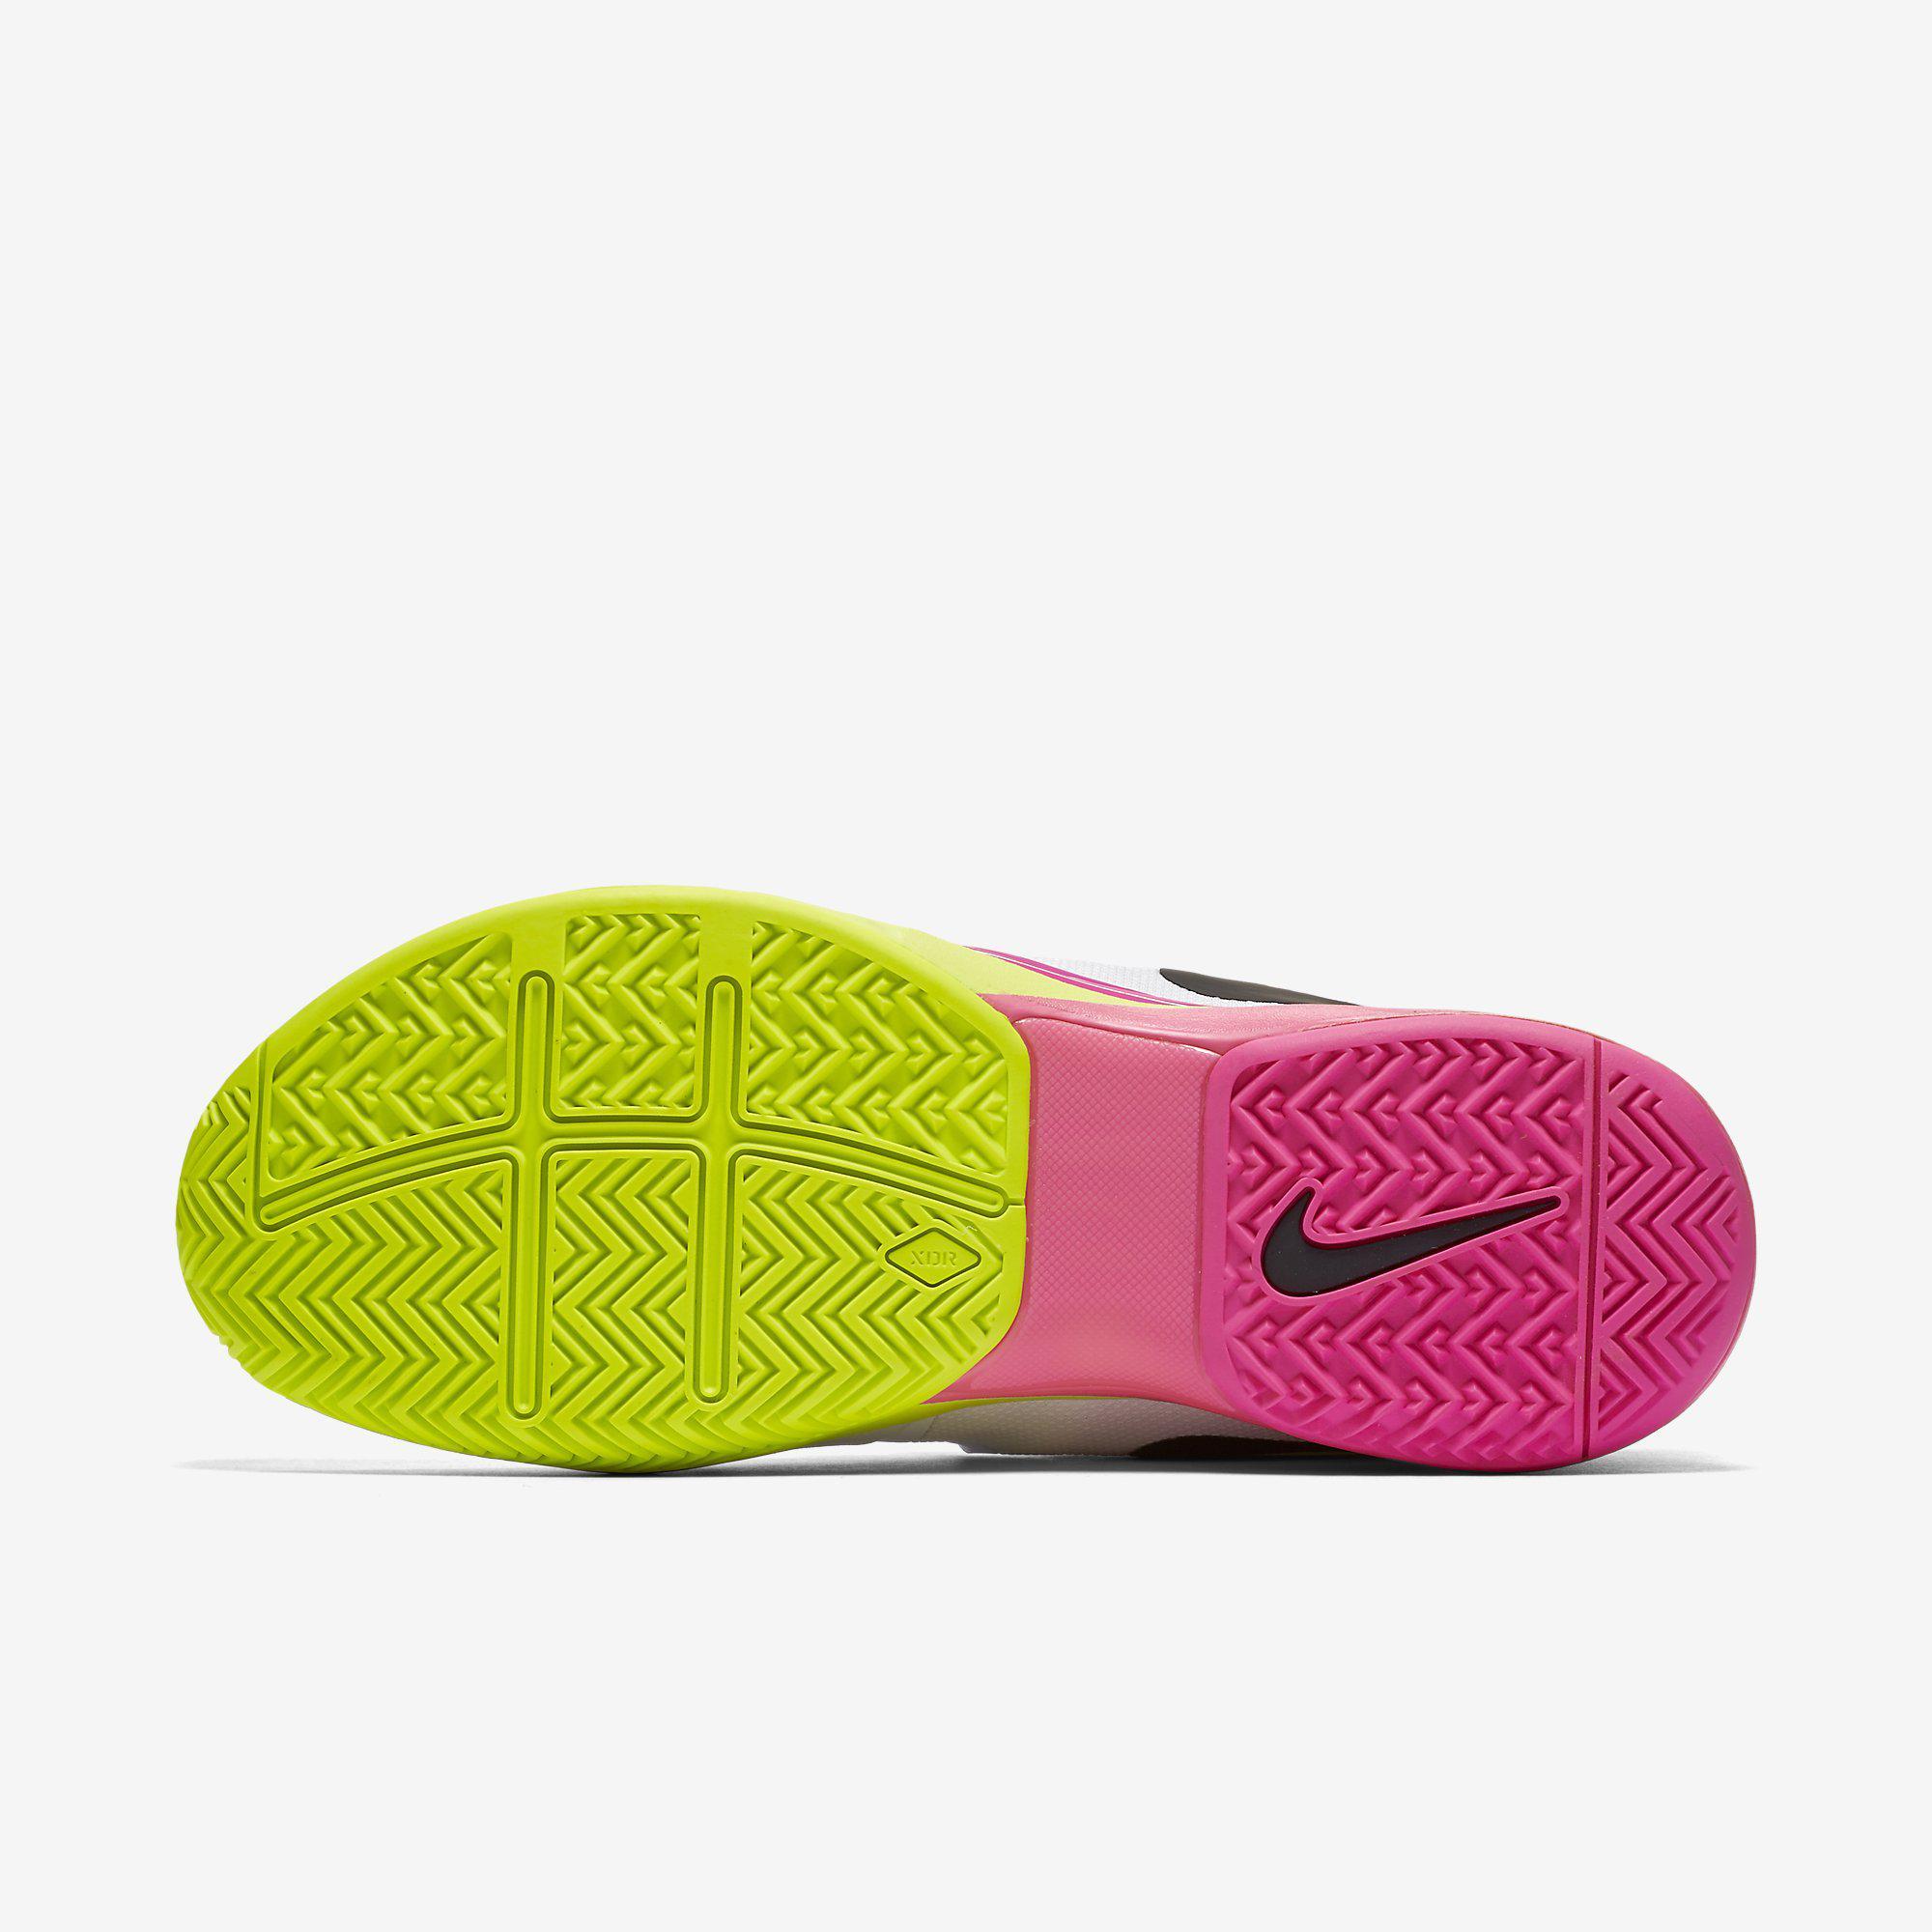 pink nike runners nike vapor 9.5 tennis shoes